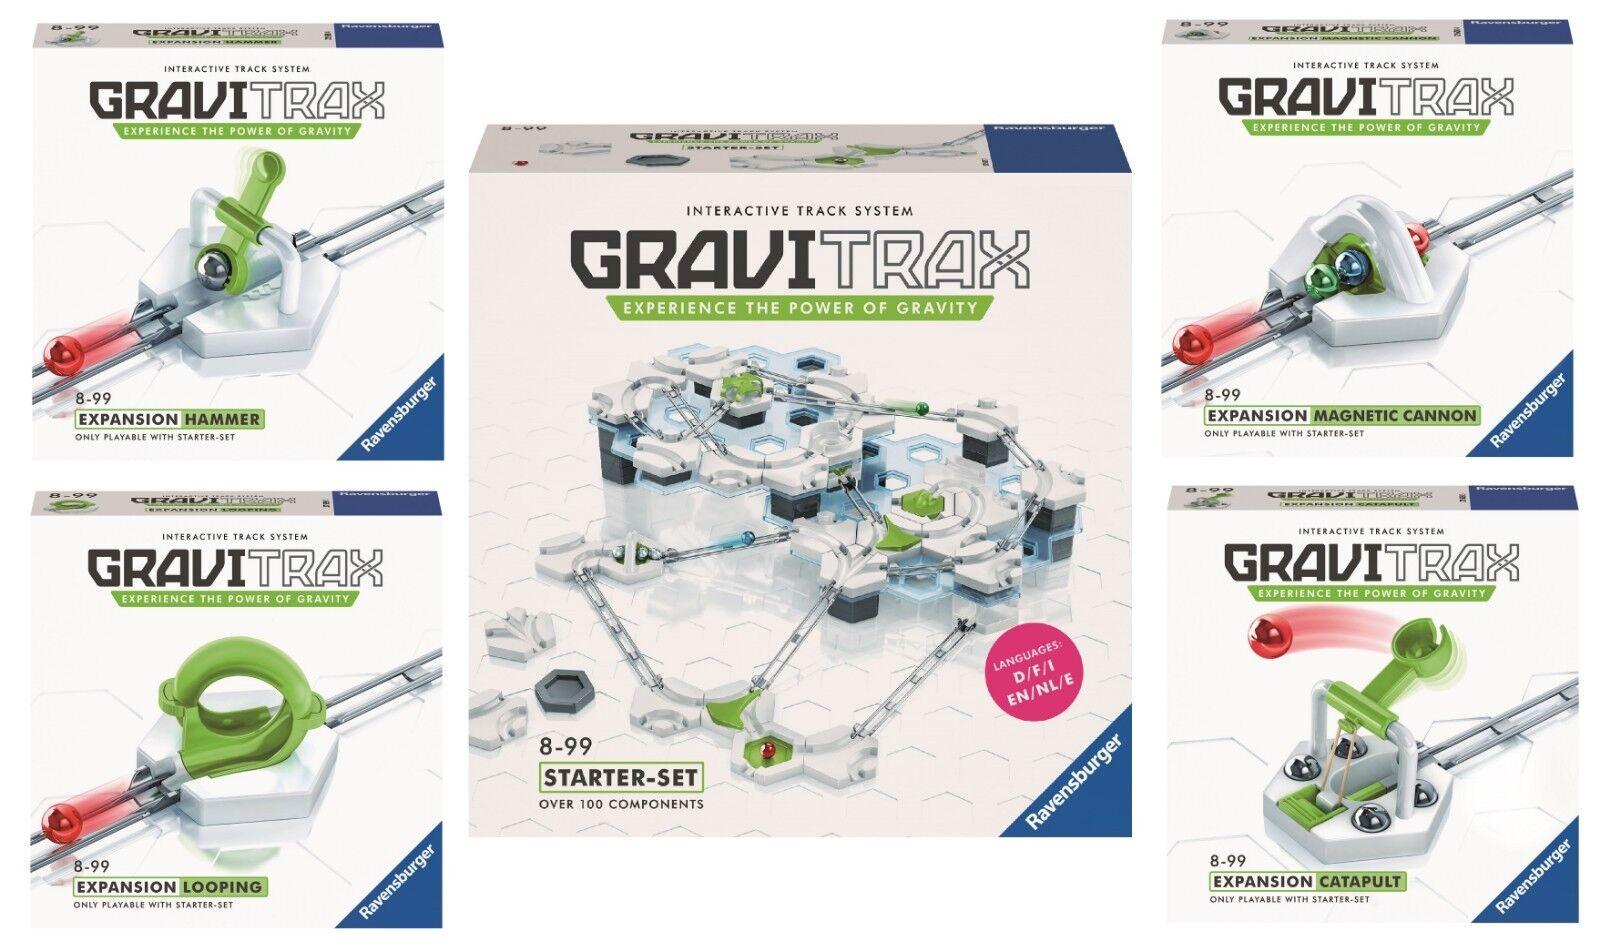 GRAVITRAX + ACCESSORIES  Starter Set Ravensburger 27597 + 4 Extensions